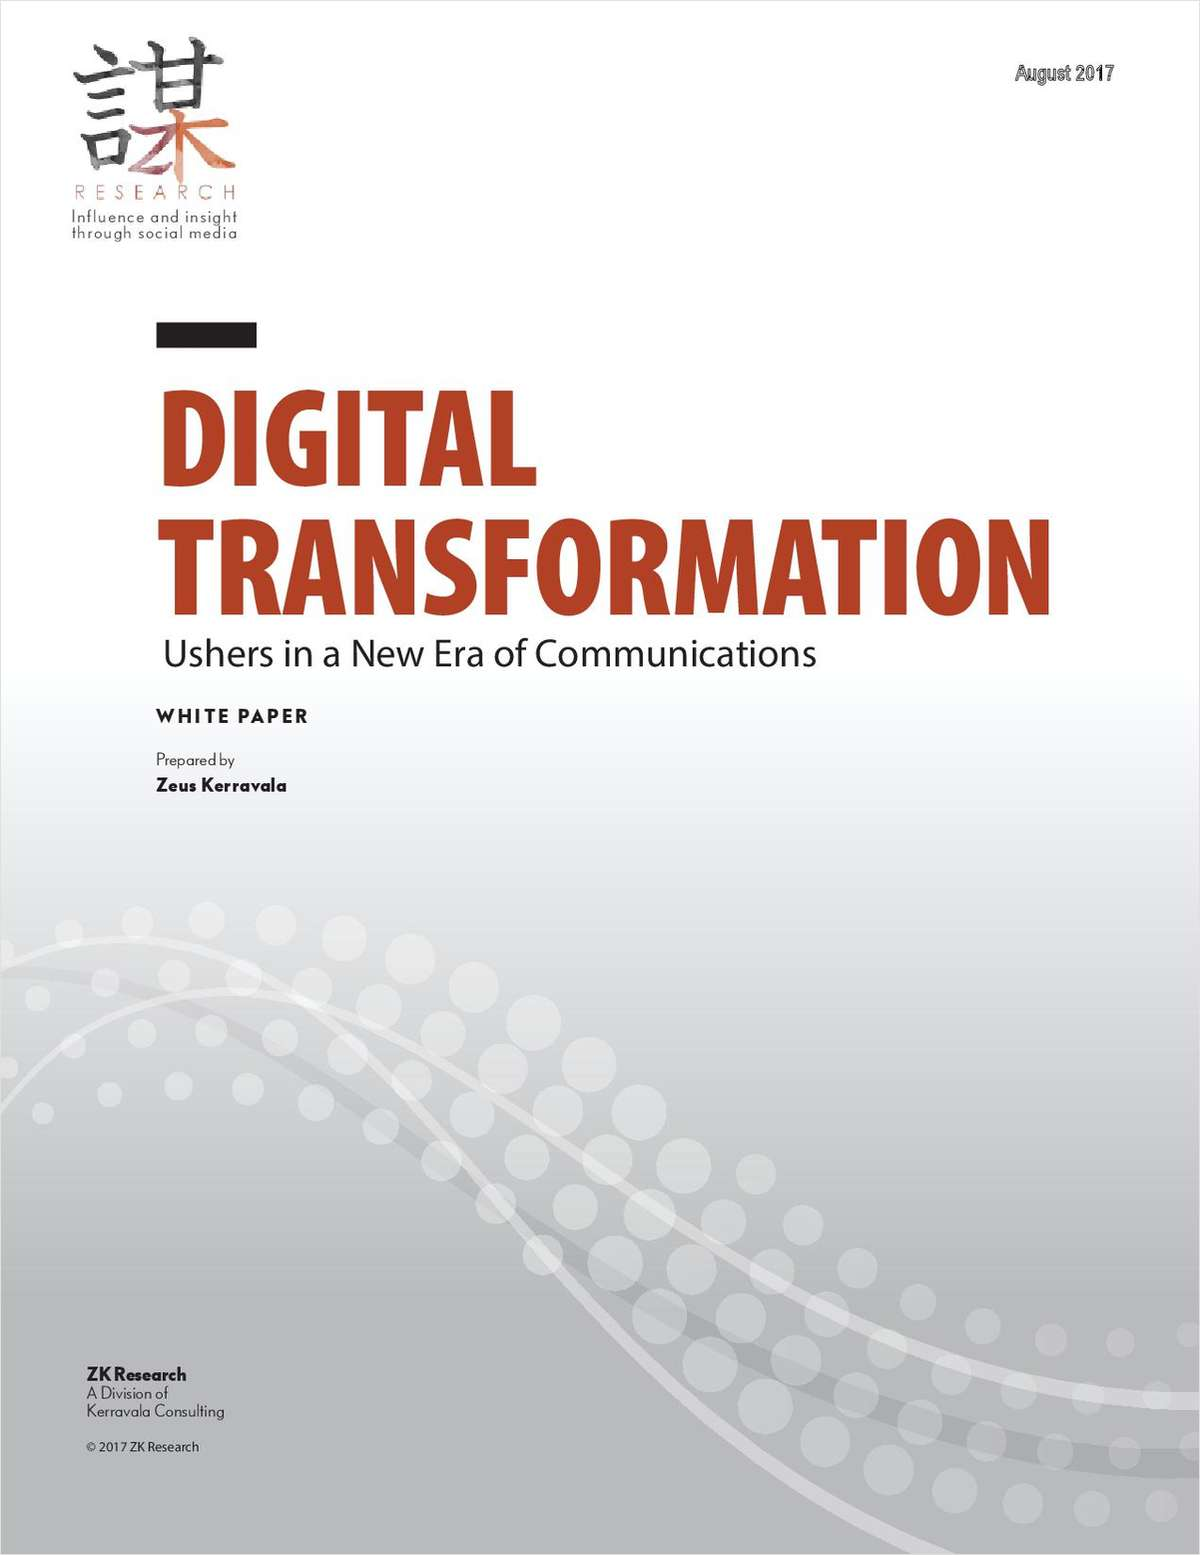 Digital Transformation Ushers in a New Era of Communications